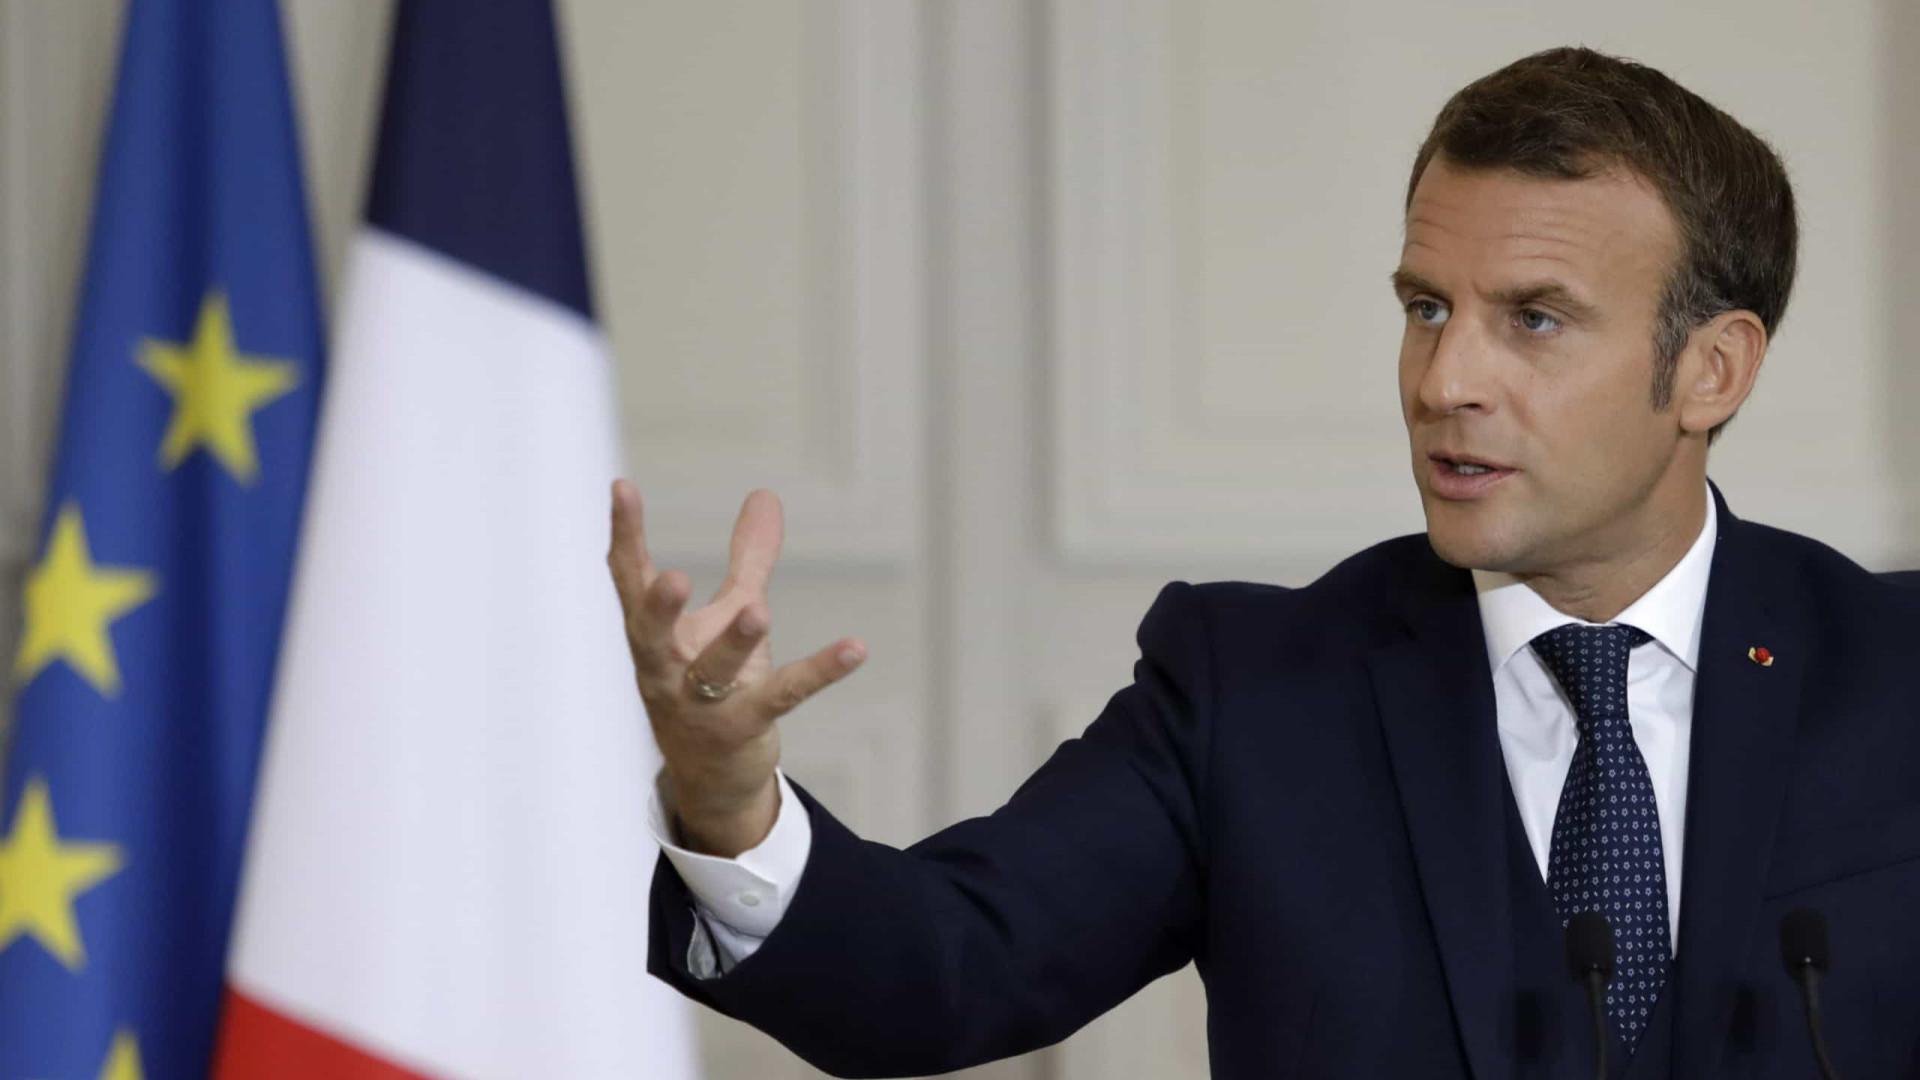 Macron Acusa Politicos Libaneses De Traicao Coletiva